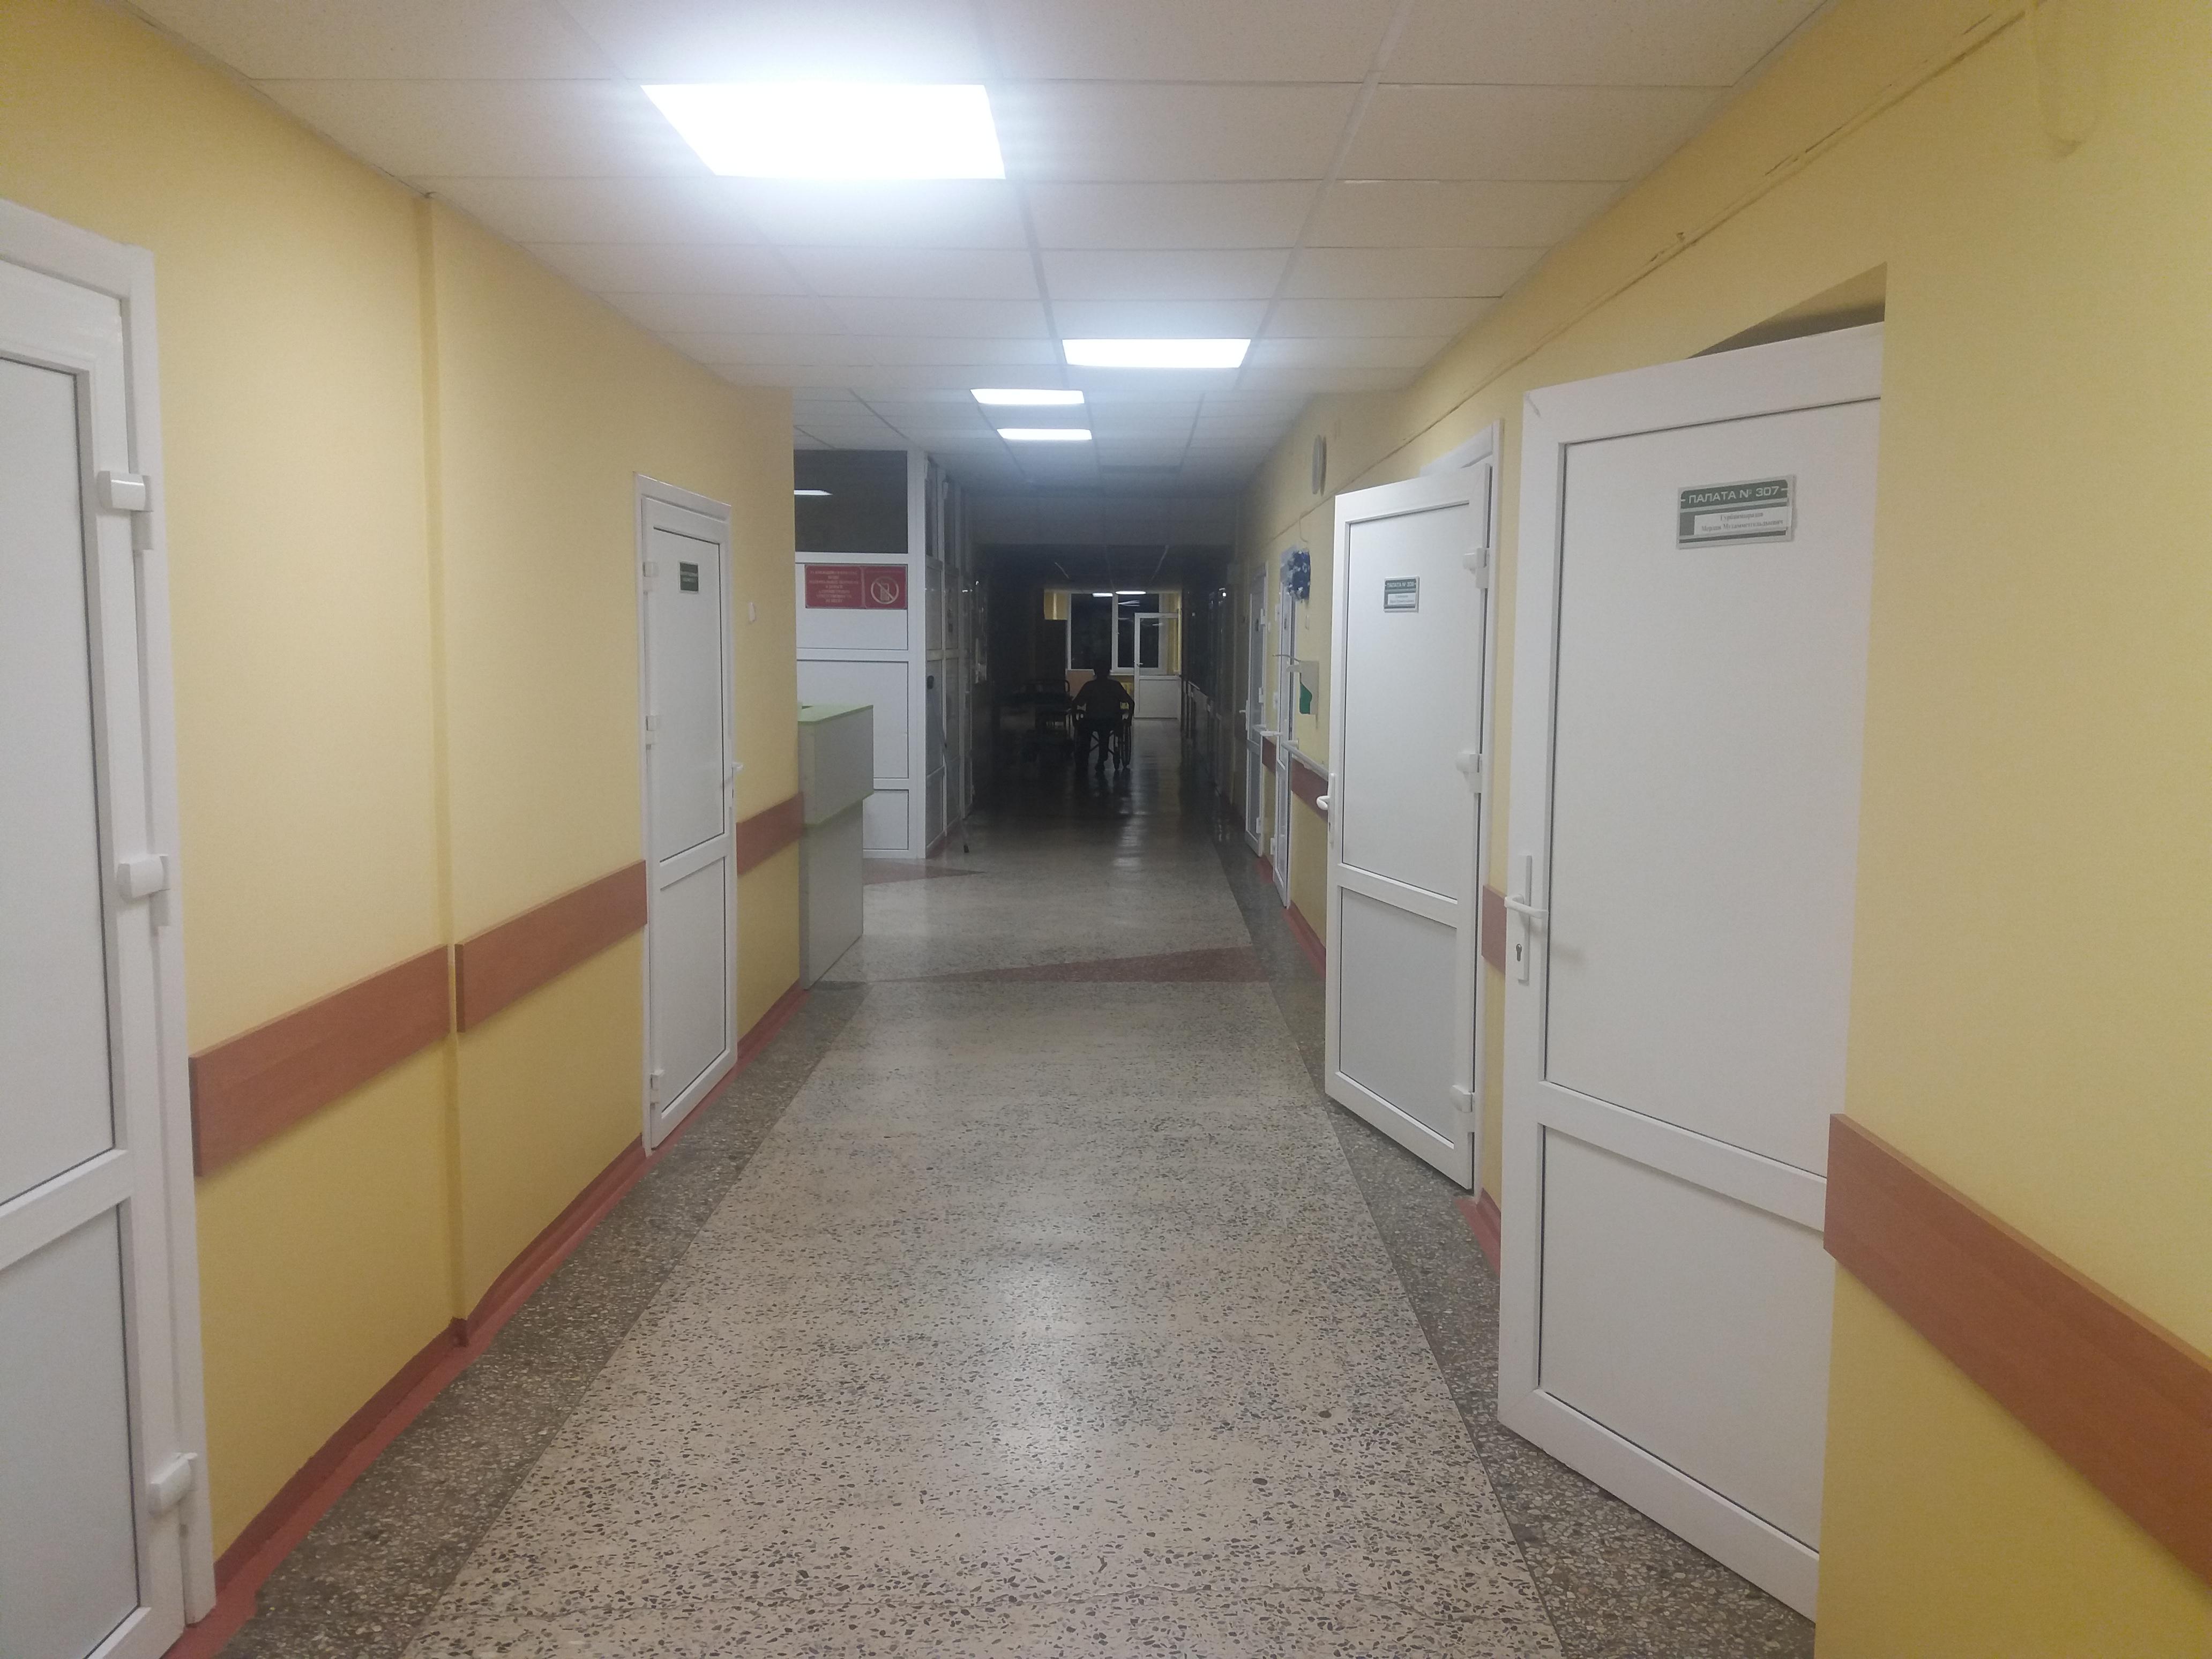 Hospital Corridor Image